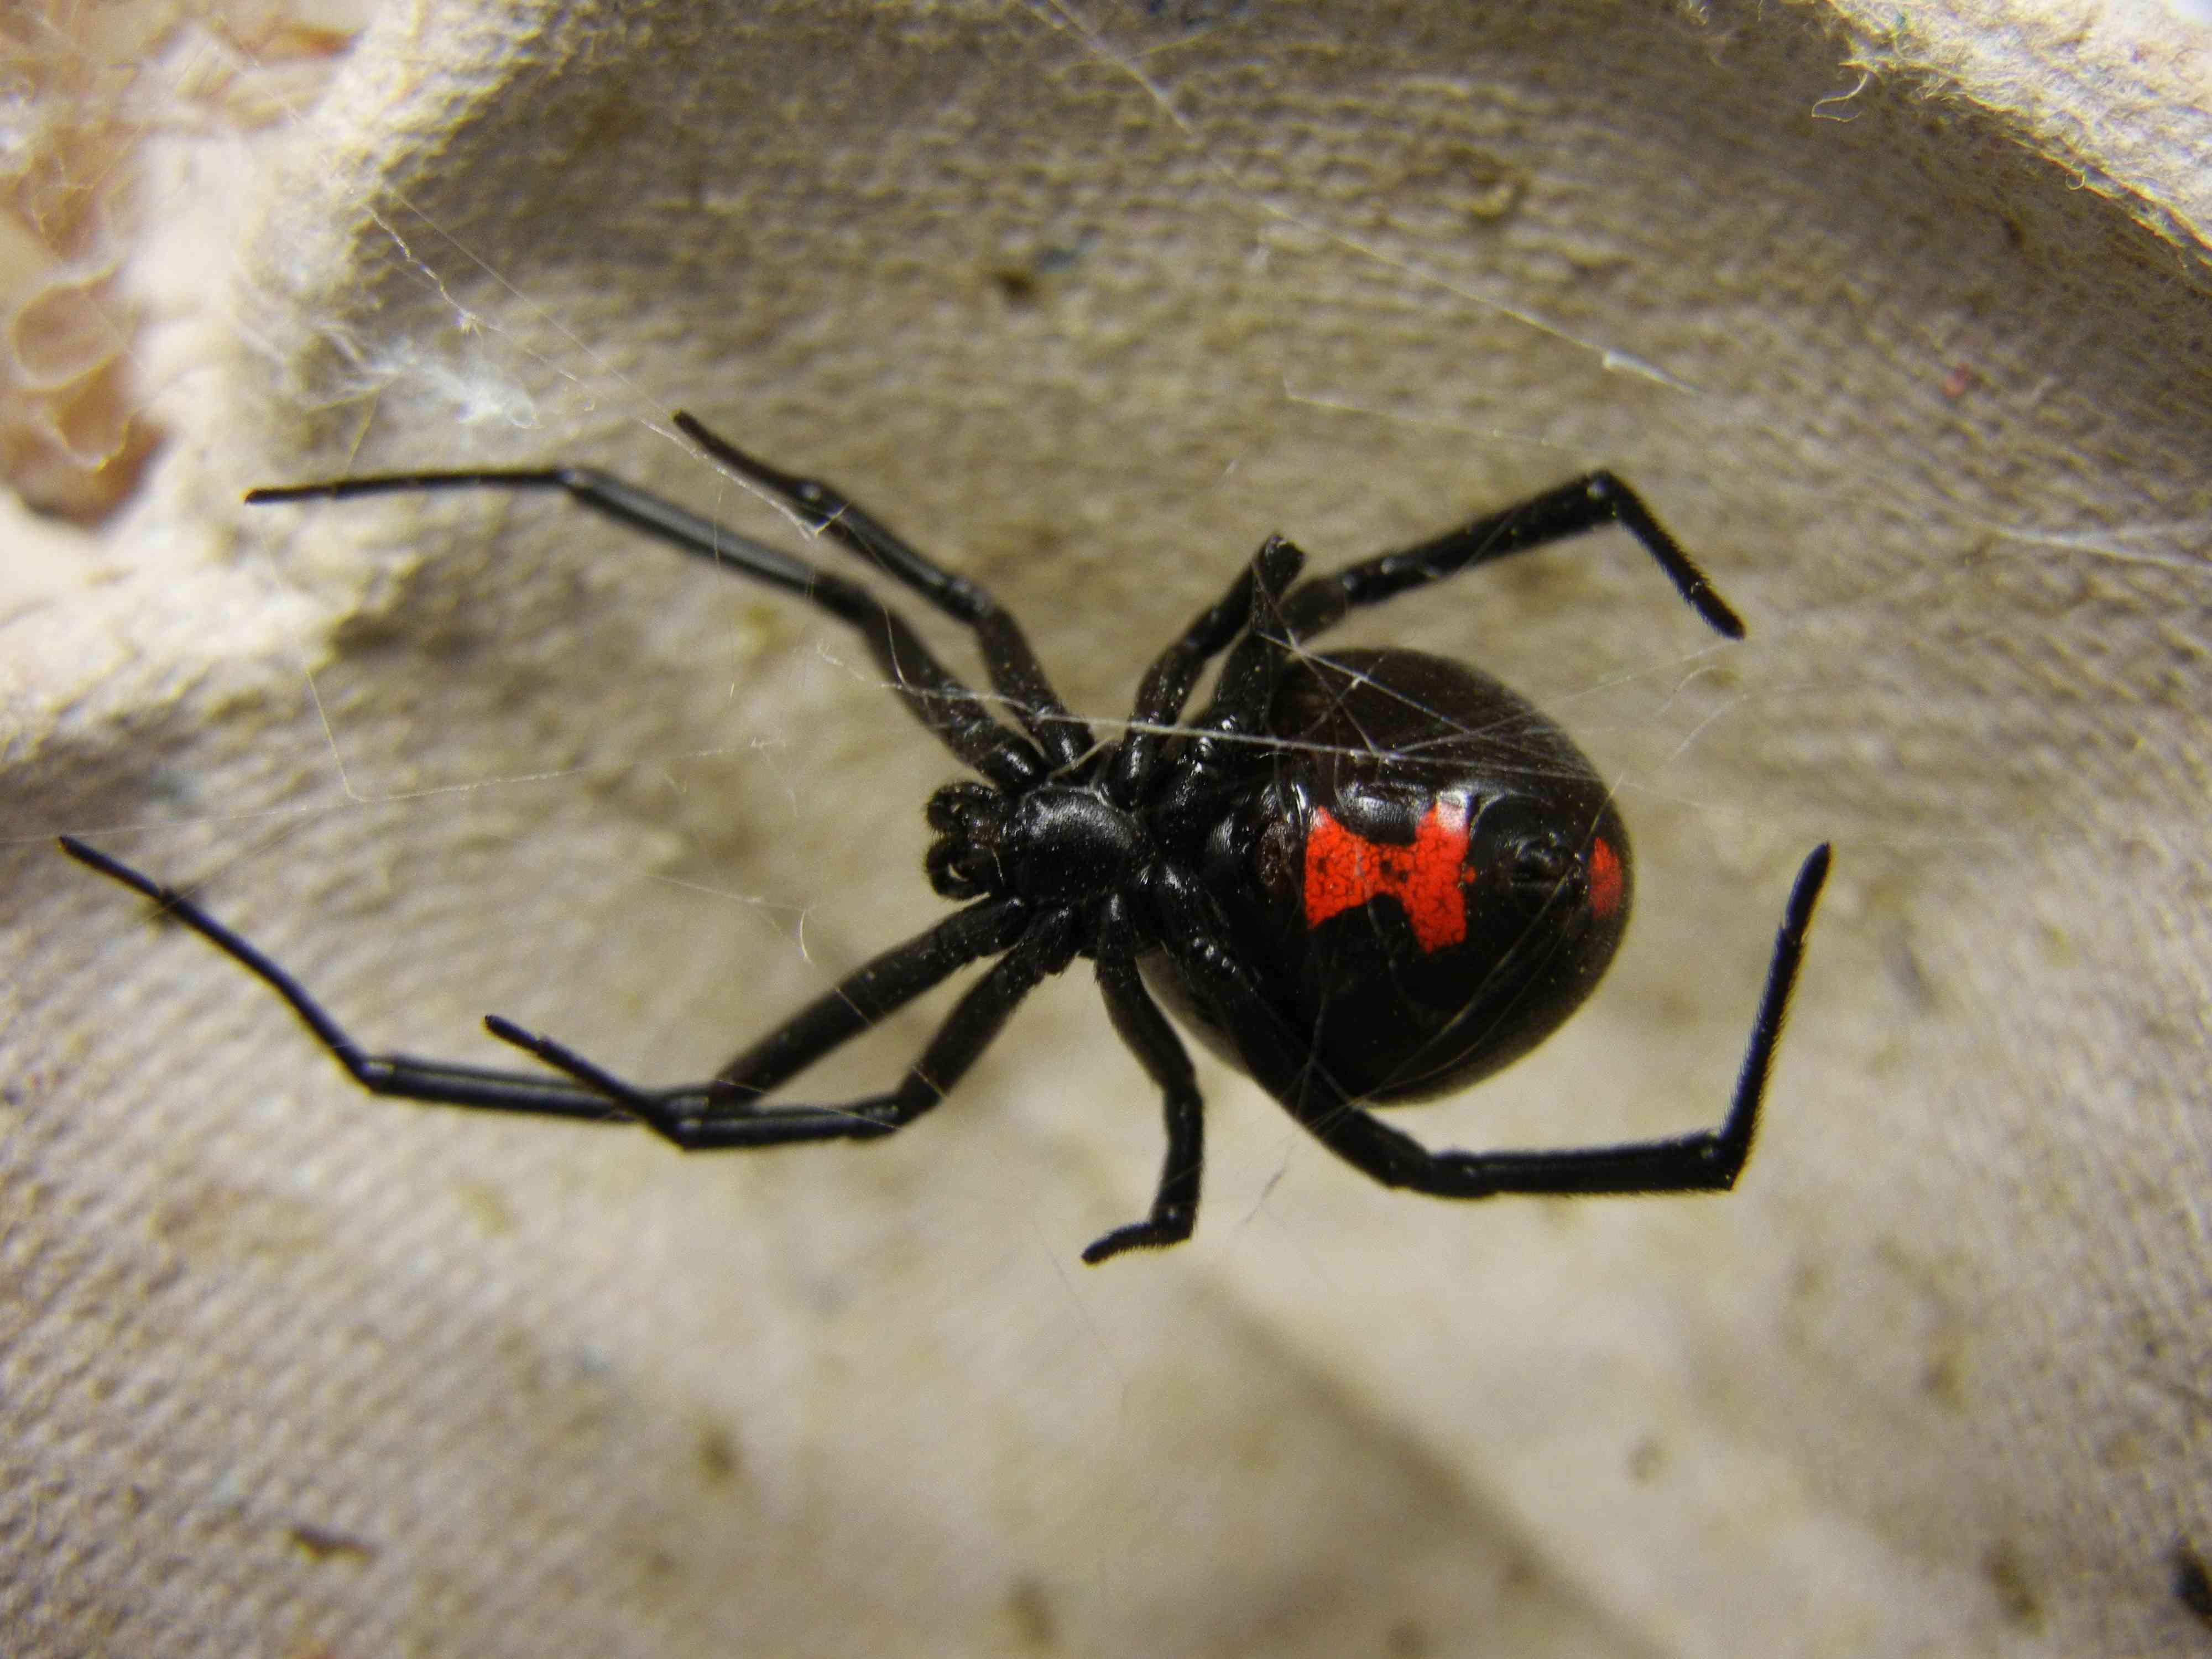 black widow spider female, with red hourglass marking on abdomen